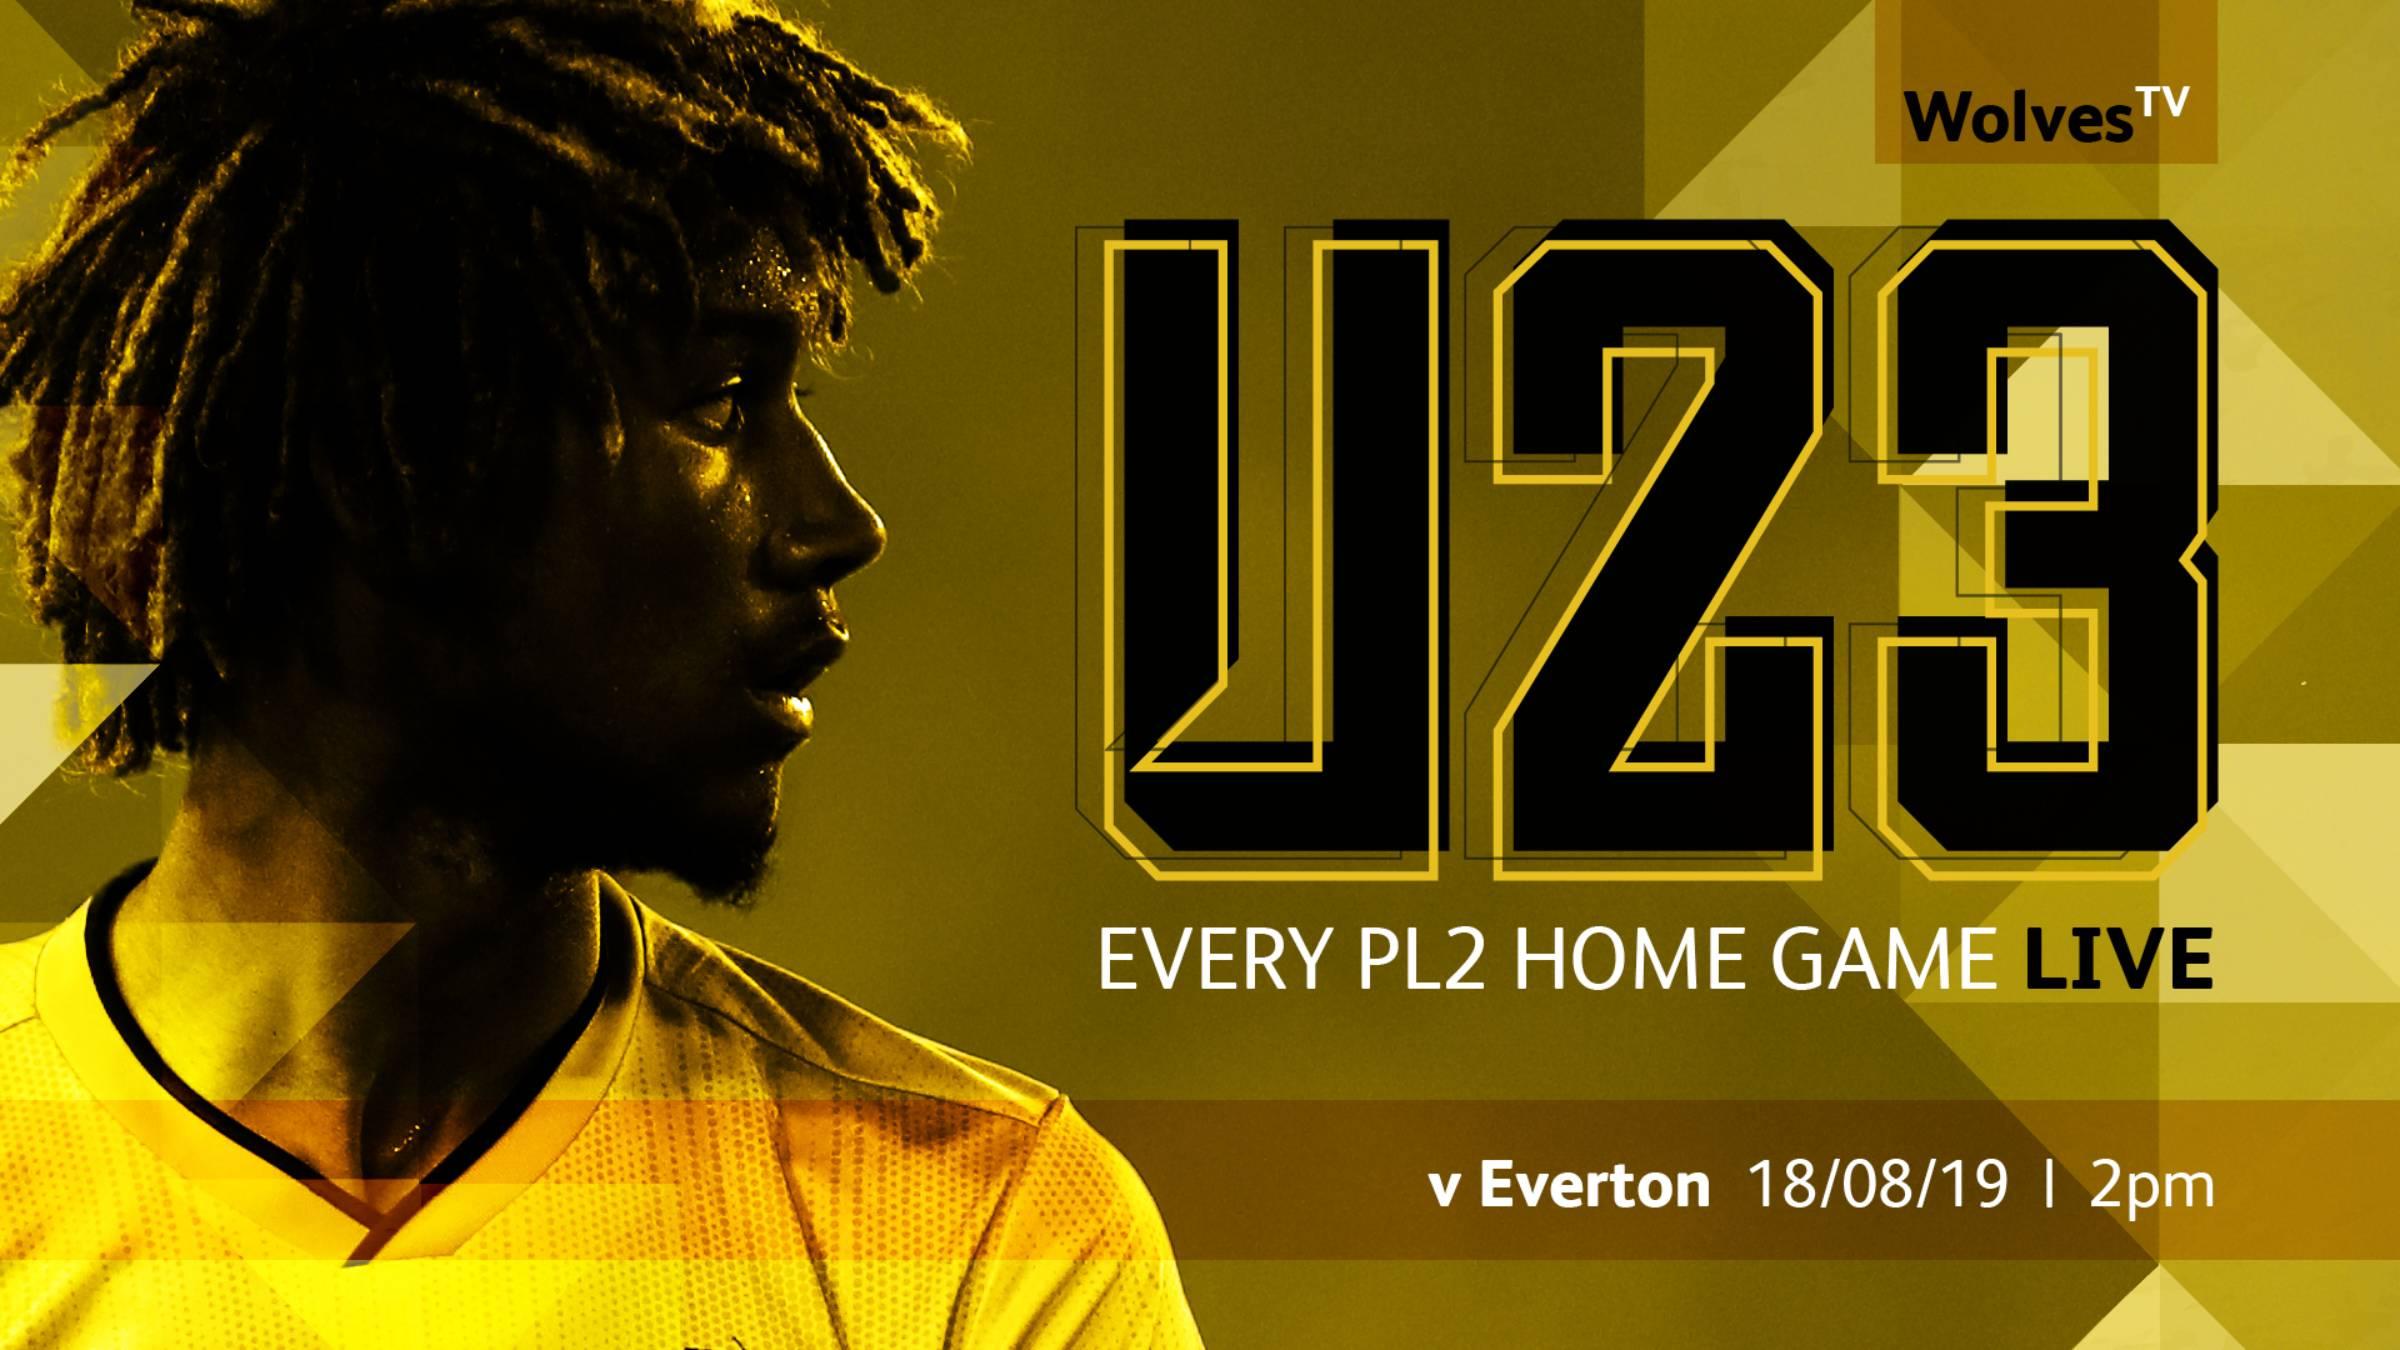 Under-23's PL2 home matches streamed live on WolvesTV